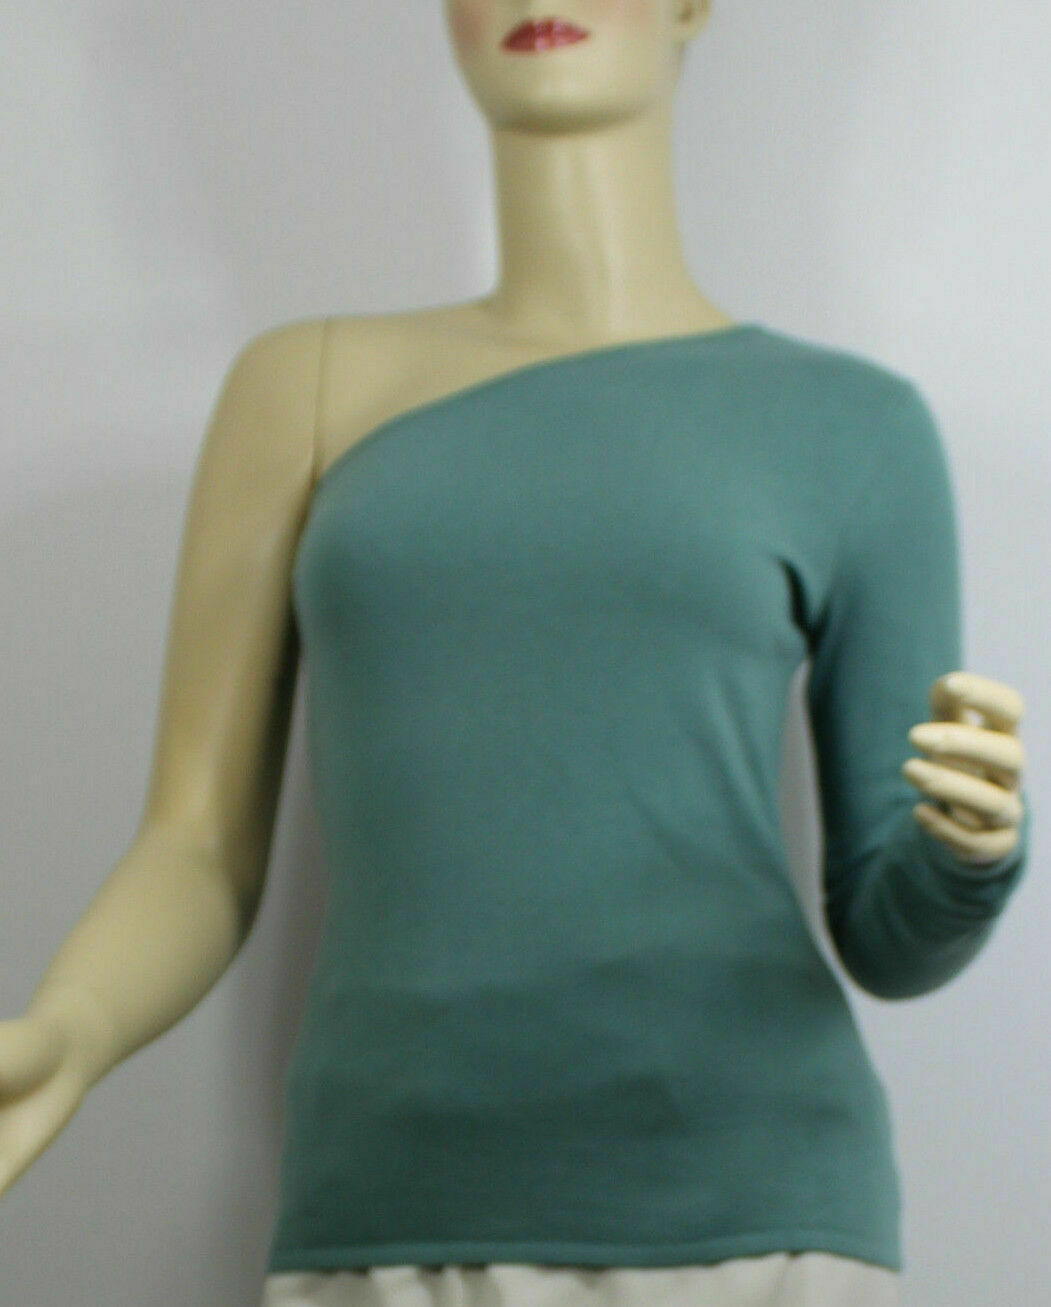 Ralph Lauren schwarz Label Cashmere damen Shirt Large Grün One Shoulder